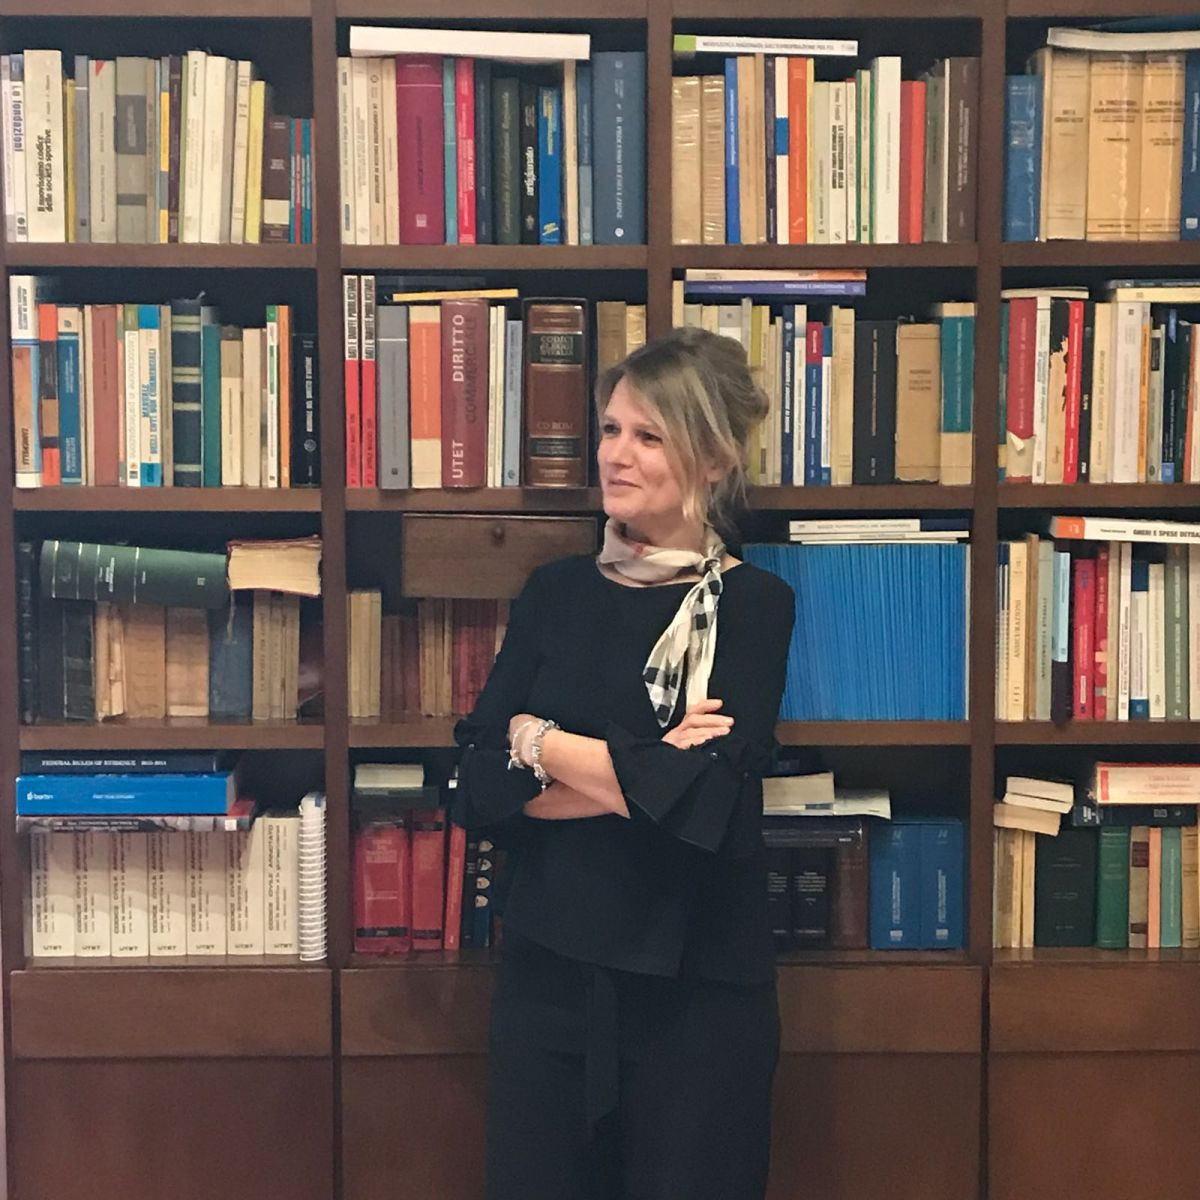 Avv. Silvia Rodaro